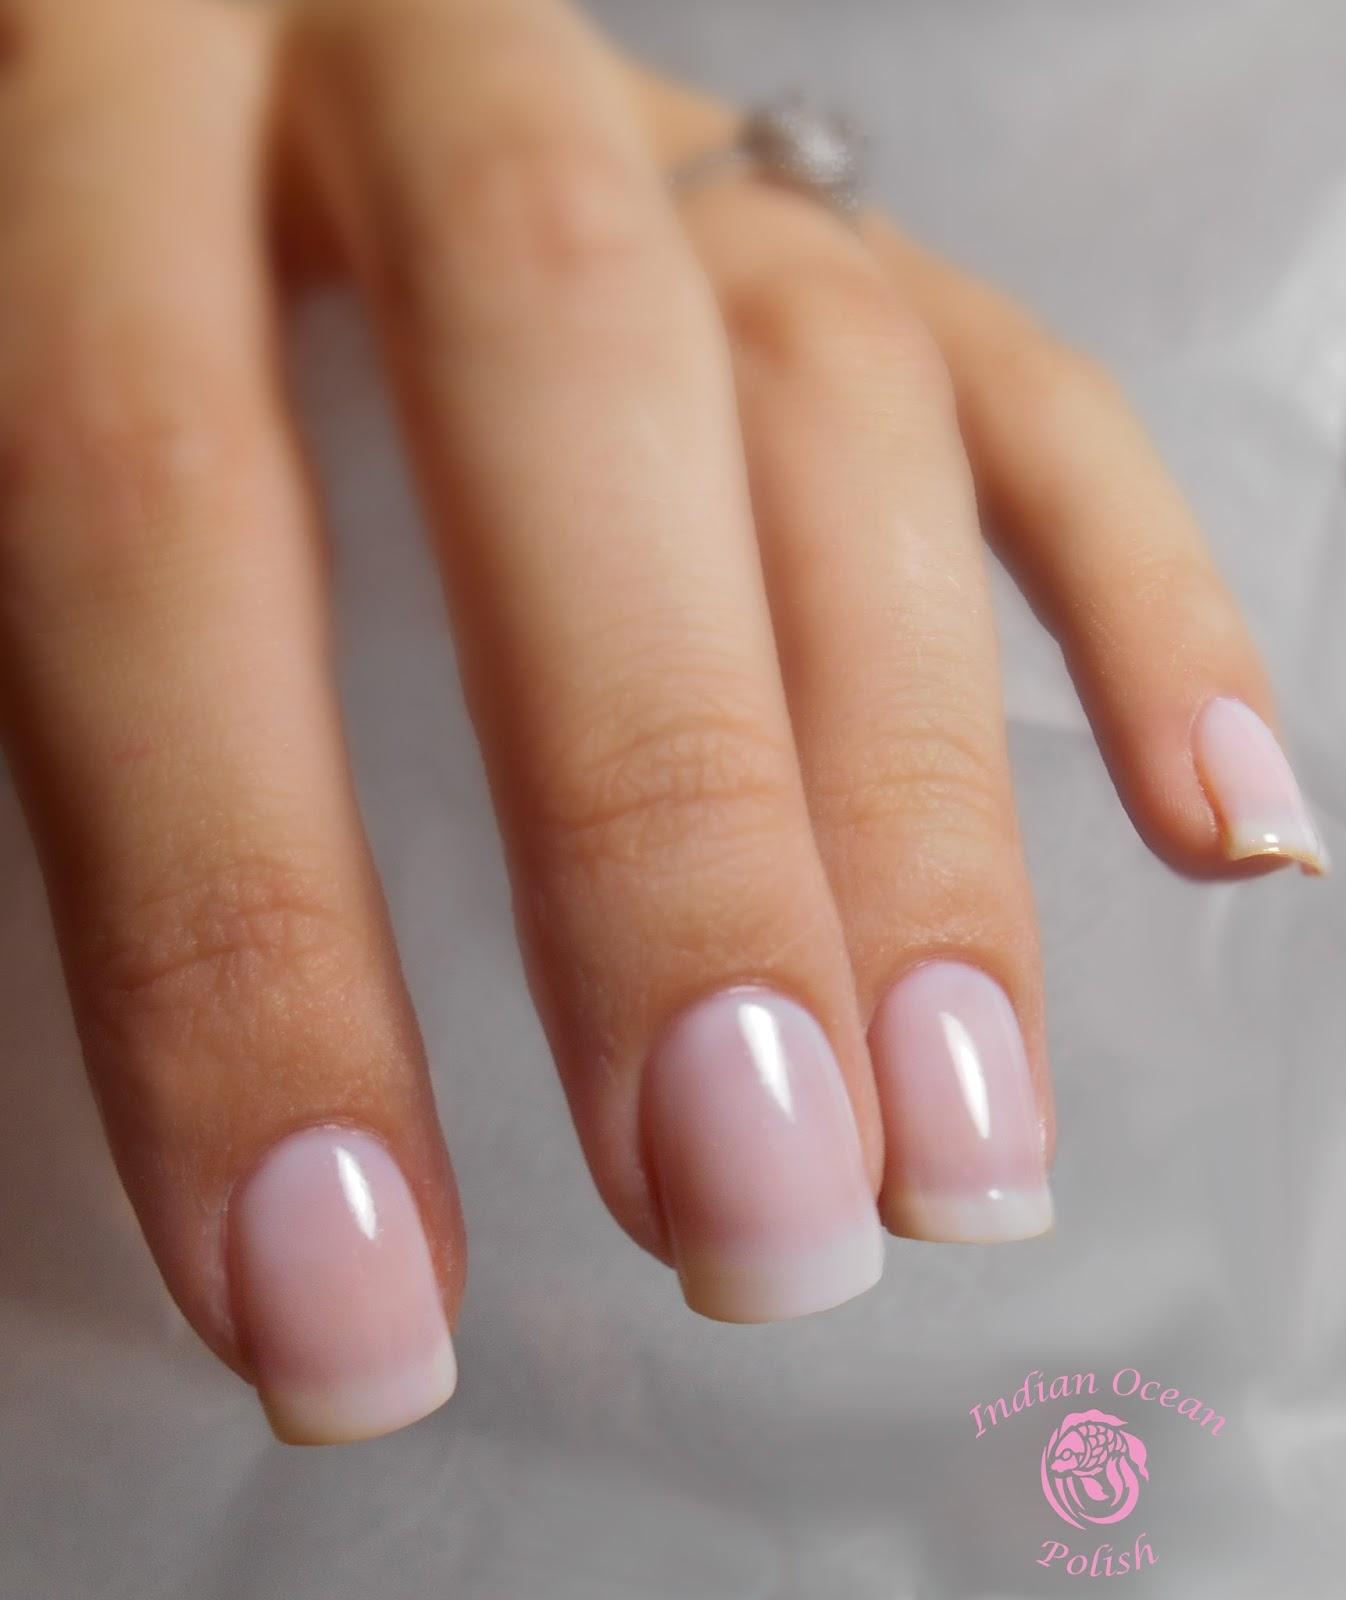 Indian Ocean Polish: Bridal Nails Special!